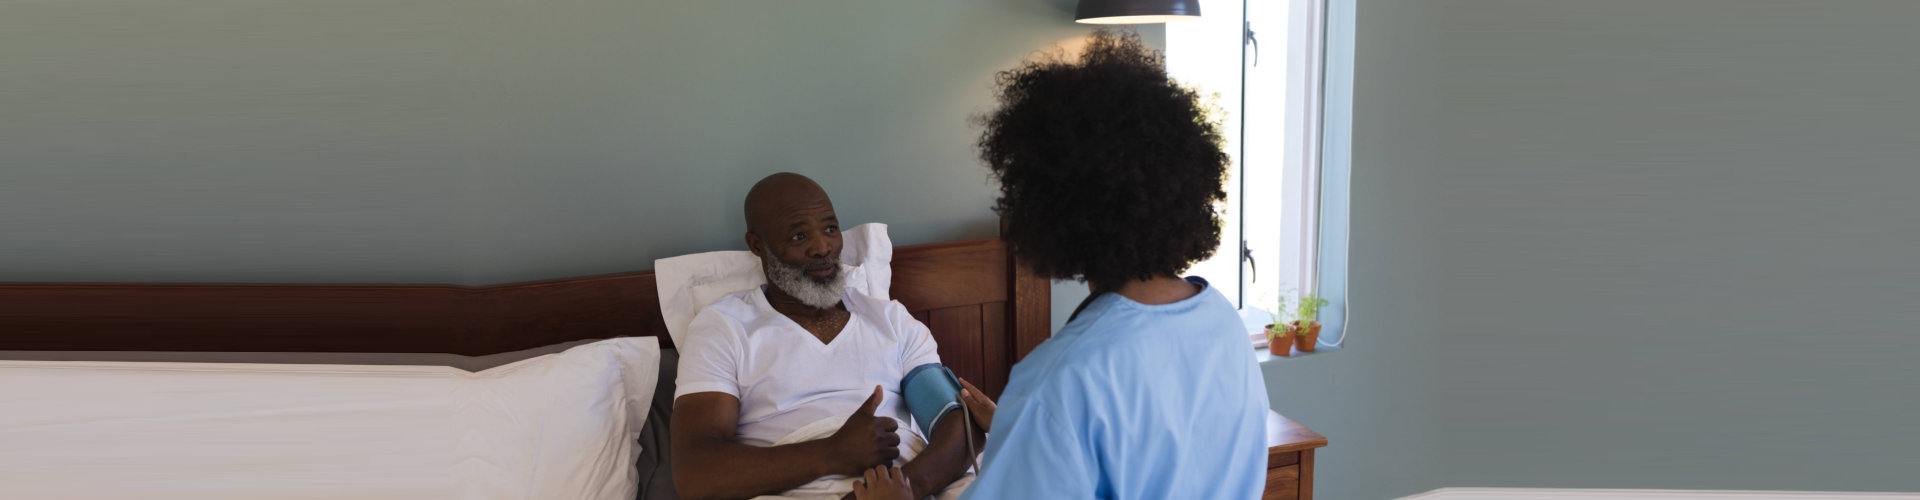 caregiver checking blood pressure of senior man